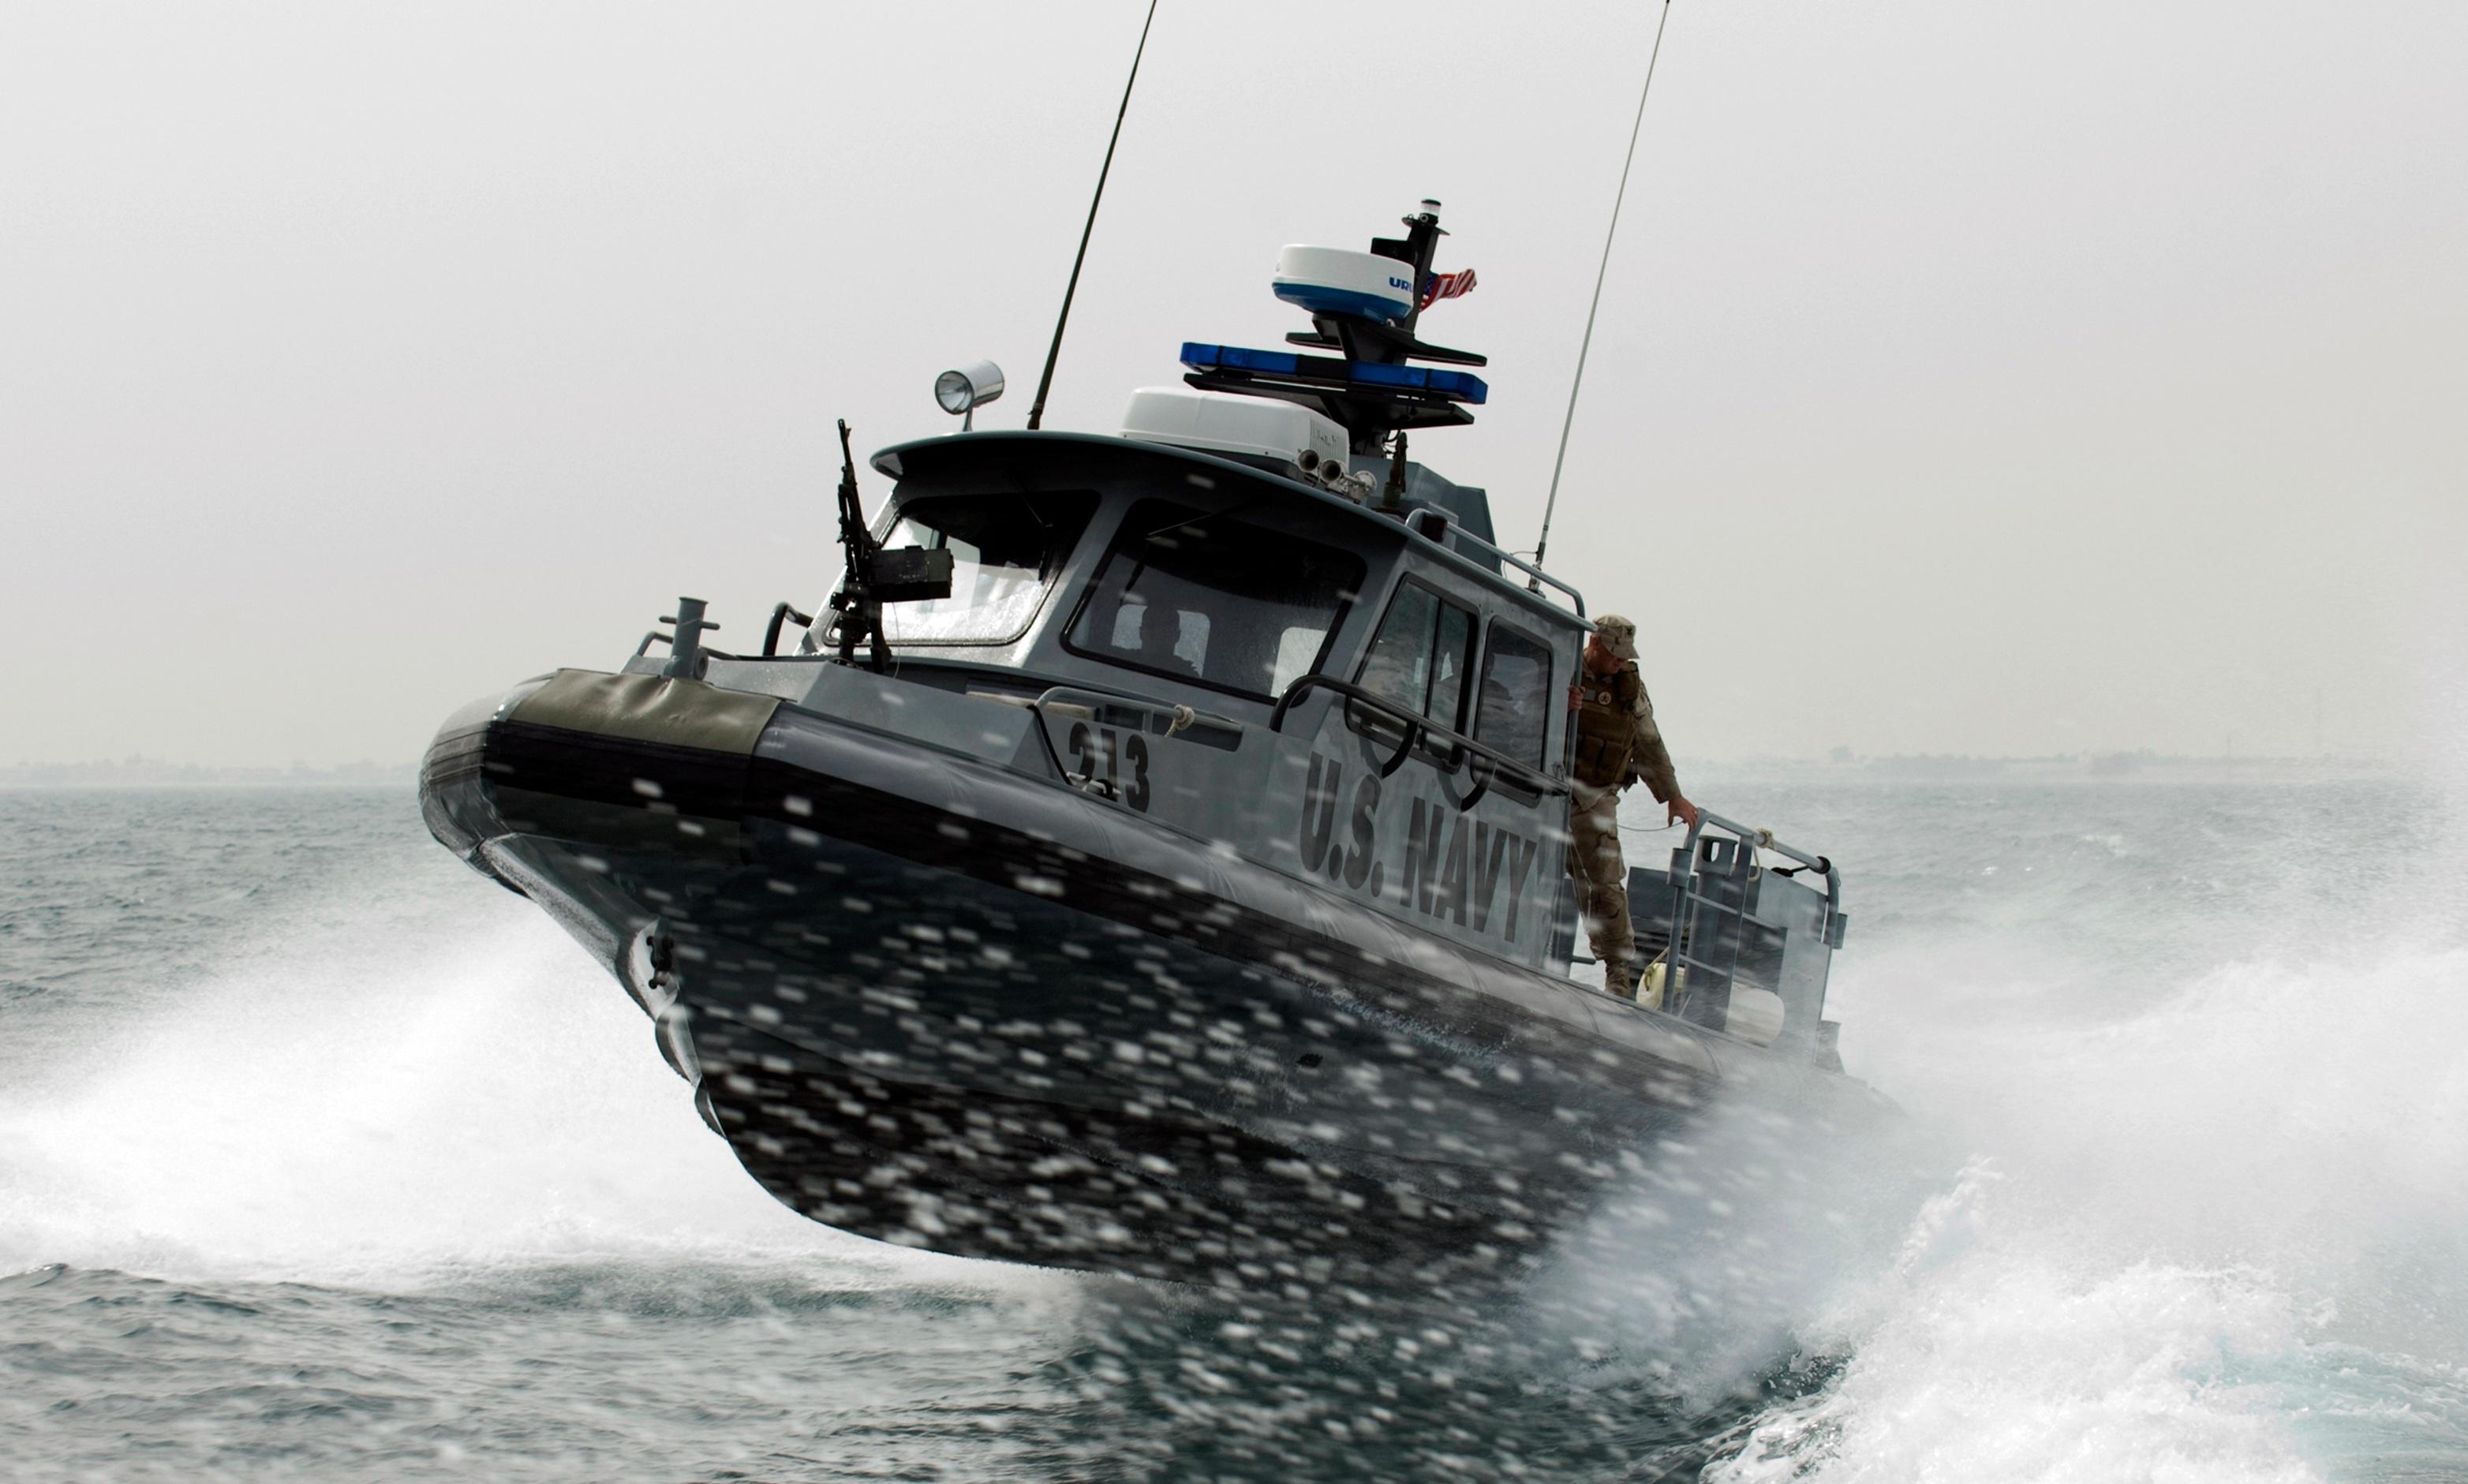 Patrol Boat, Boat, Navy, Ocean, Patrol, HQ Photo